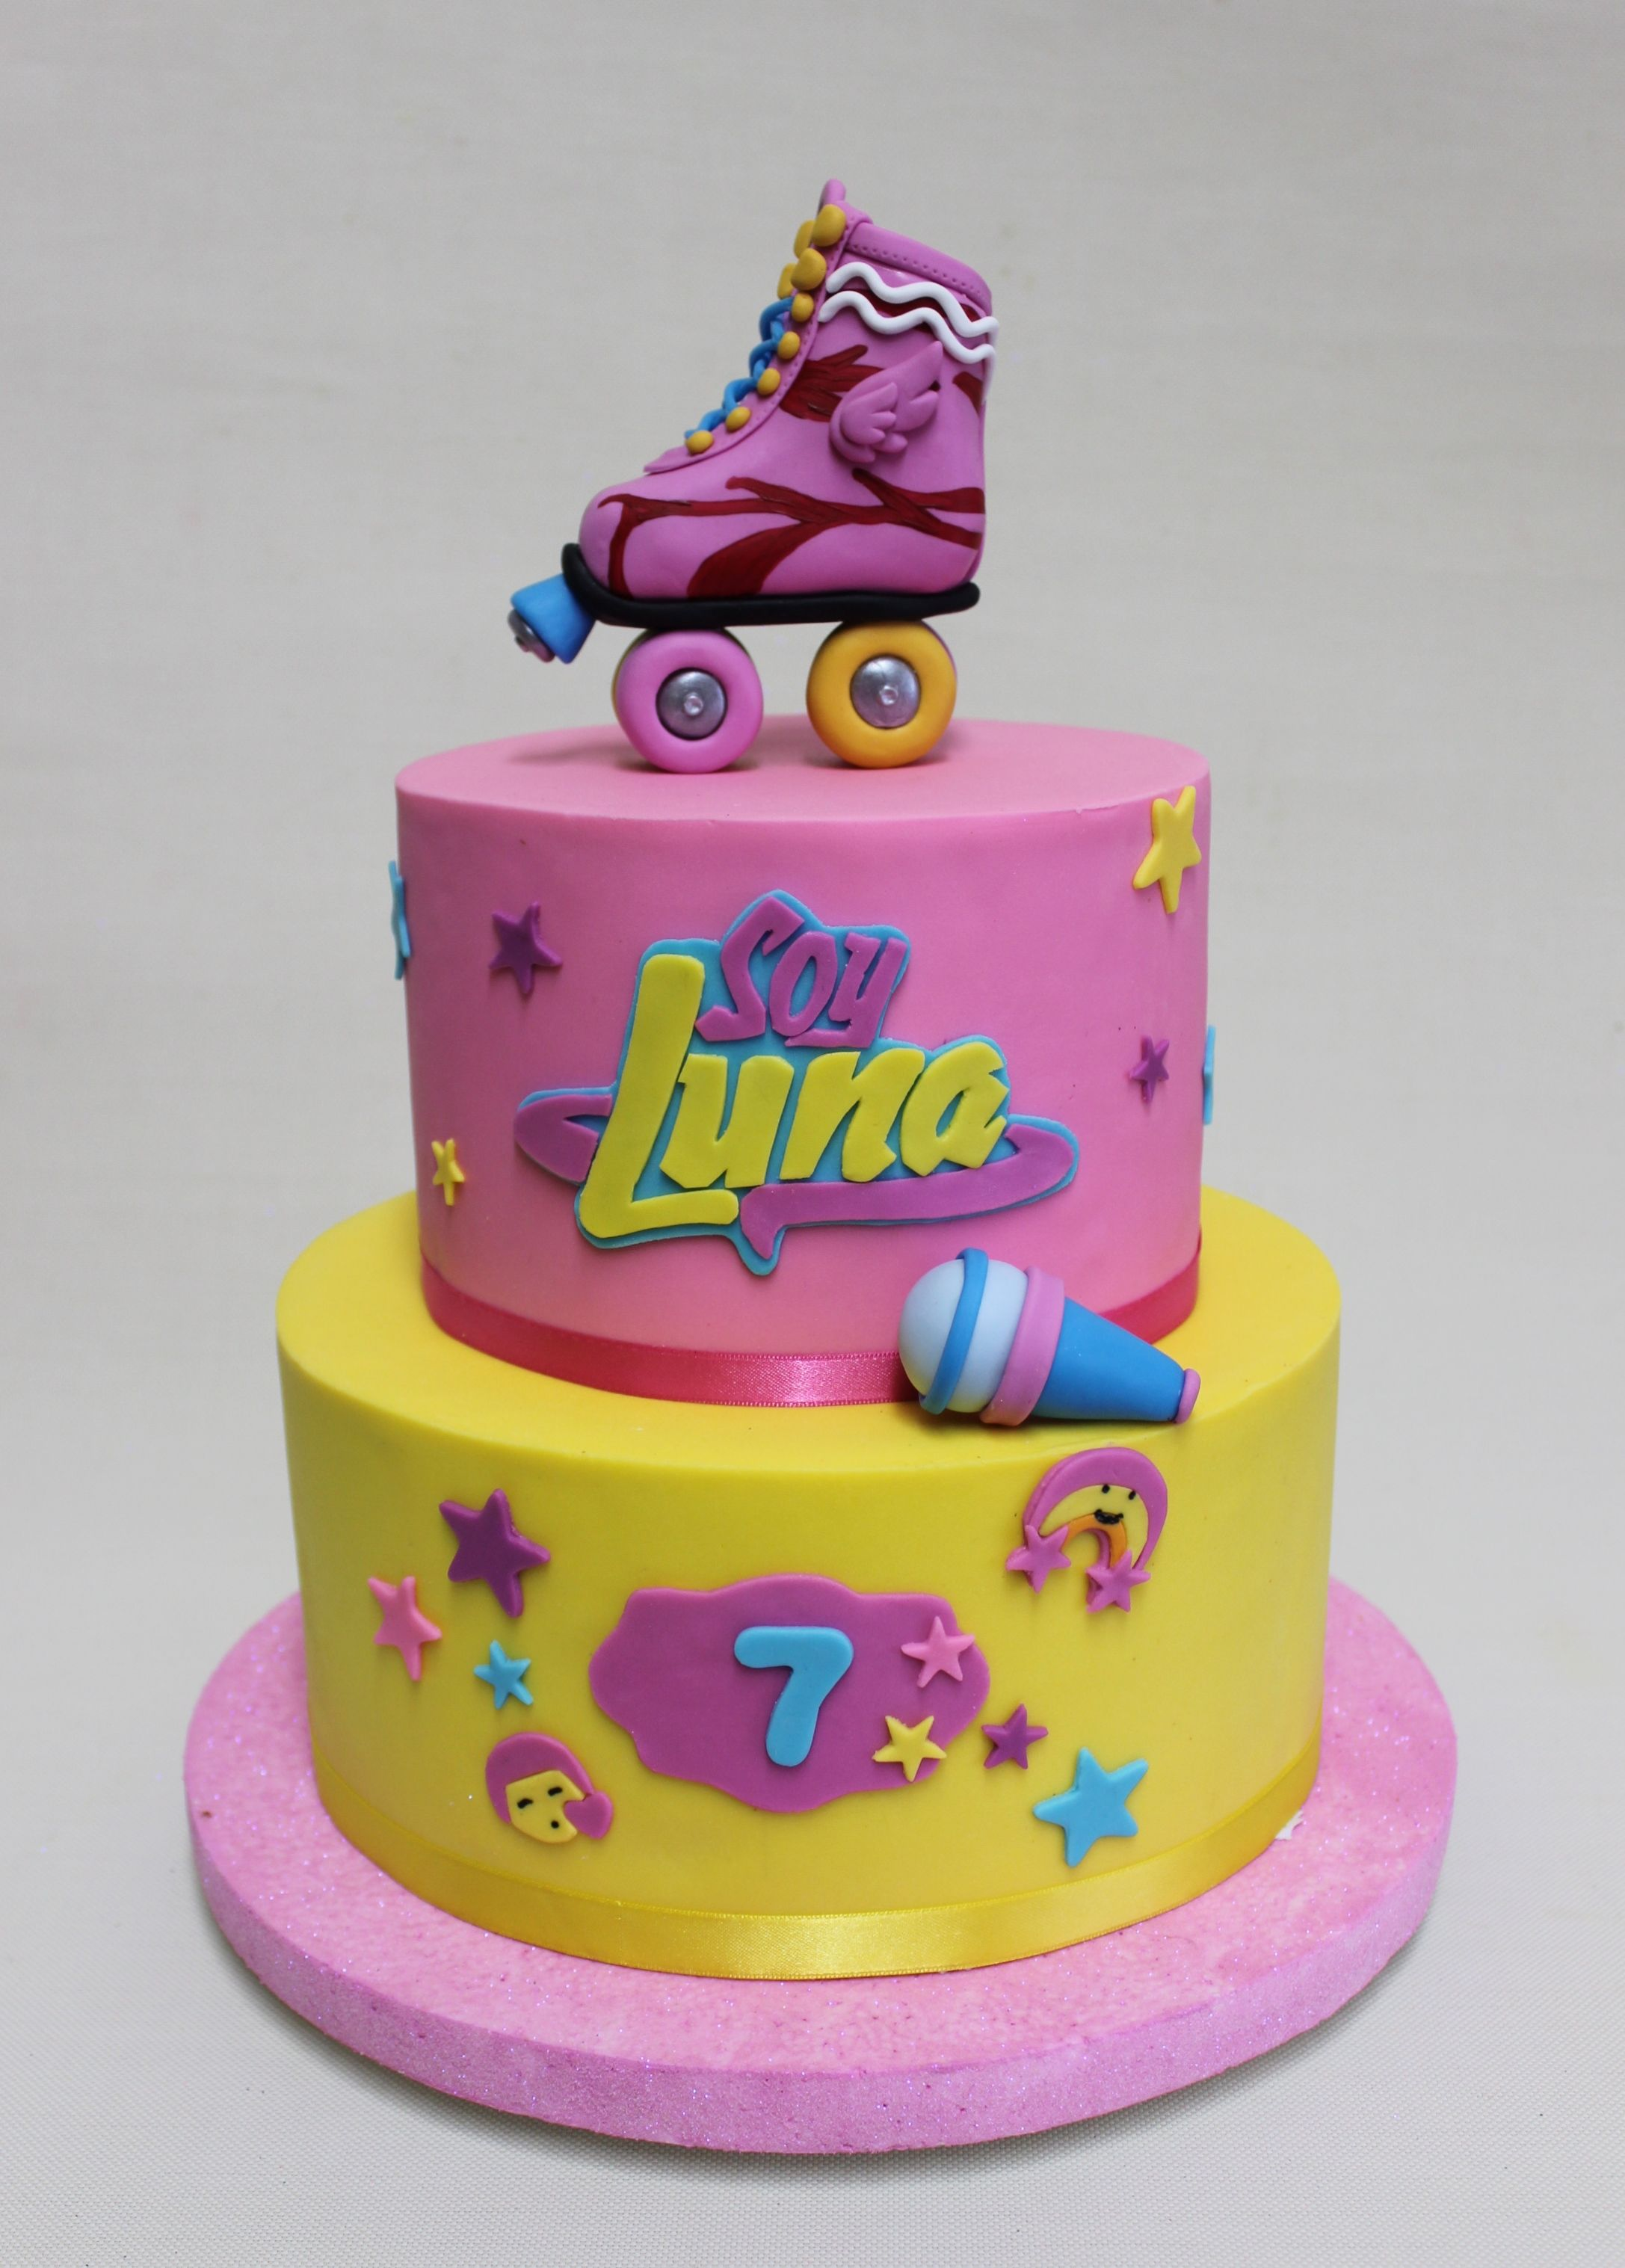 Torta soy luna violeta glace birthdays cakes pinterest for Un cuarto con luna facebook